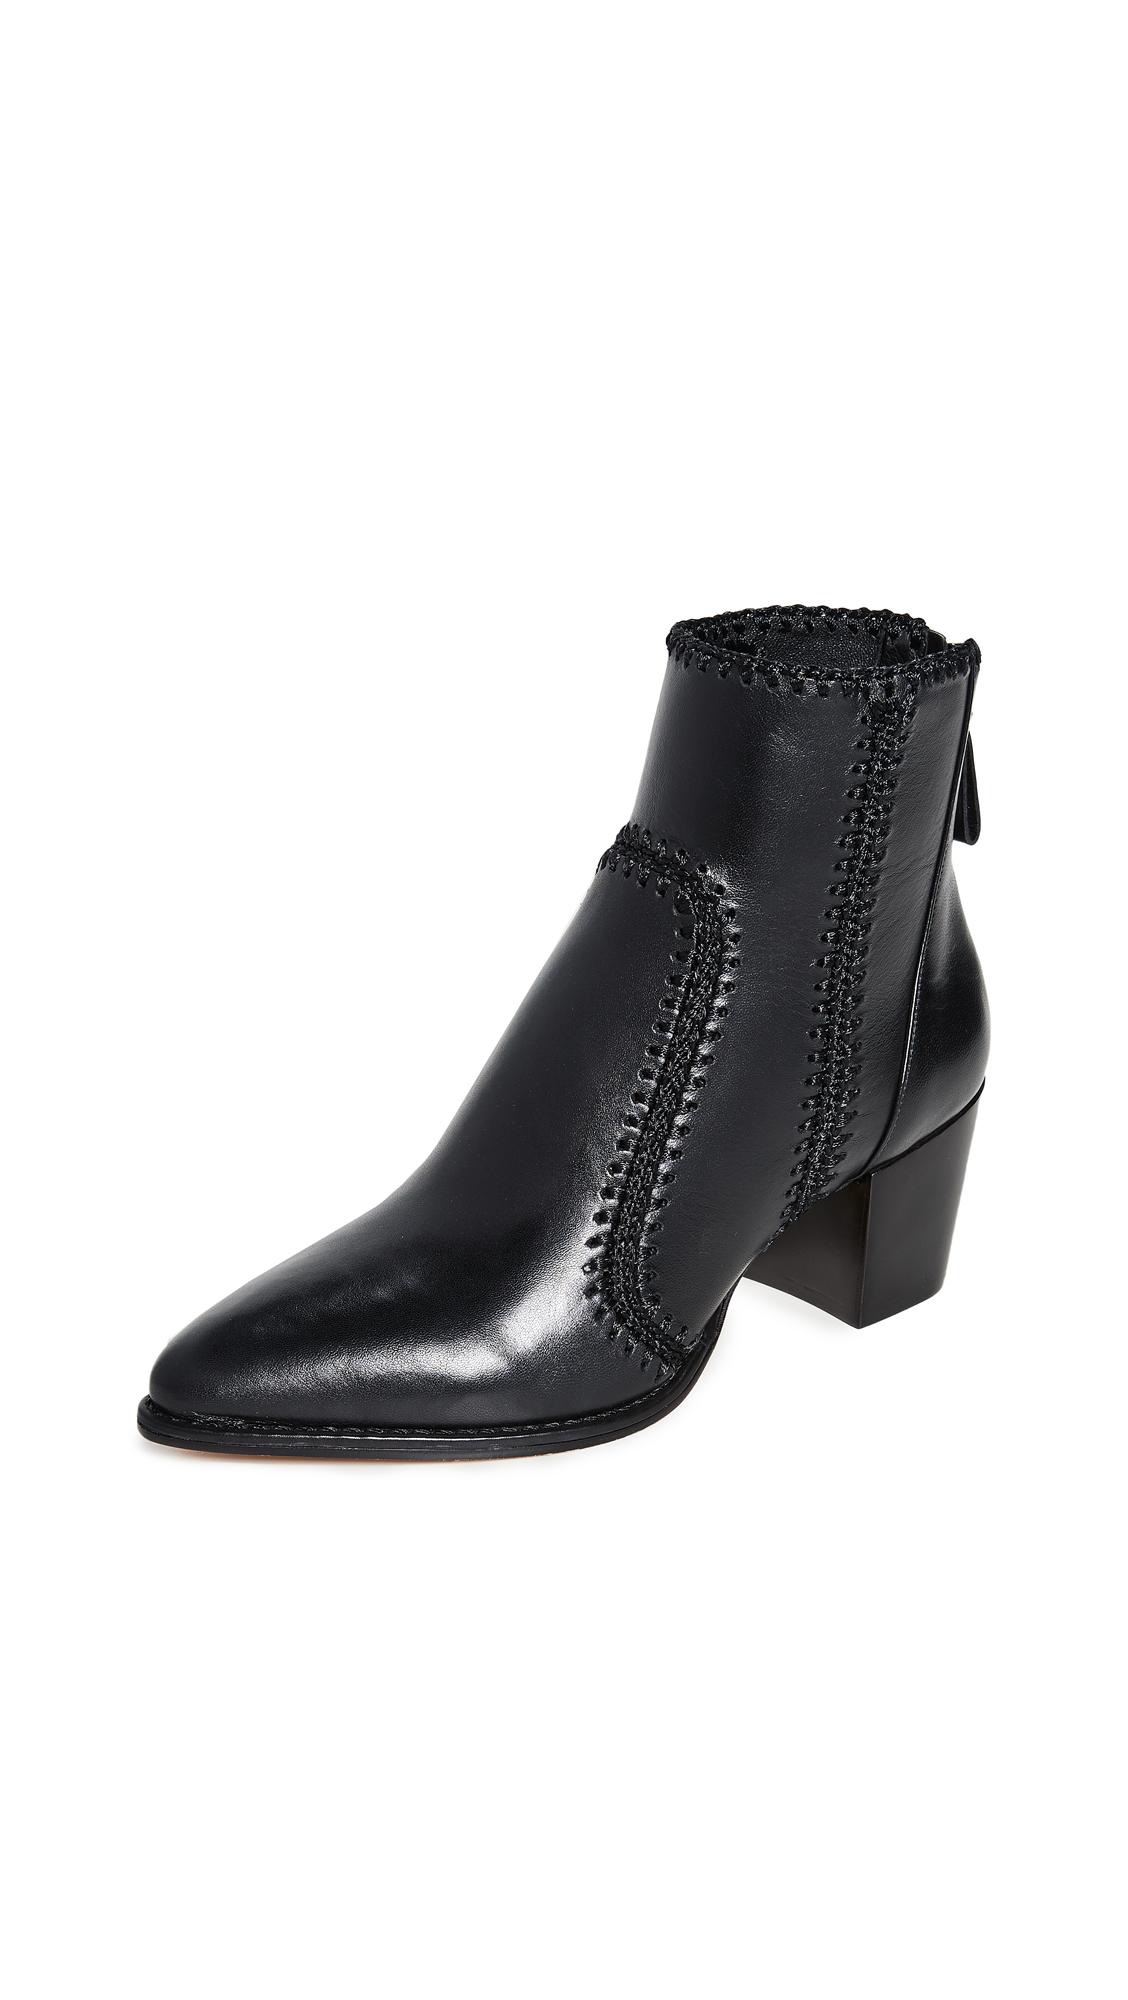 Alexandre Birman Benta Boots - Black